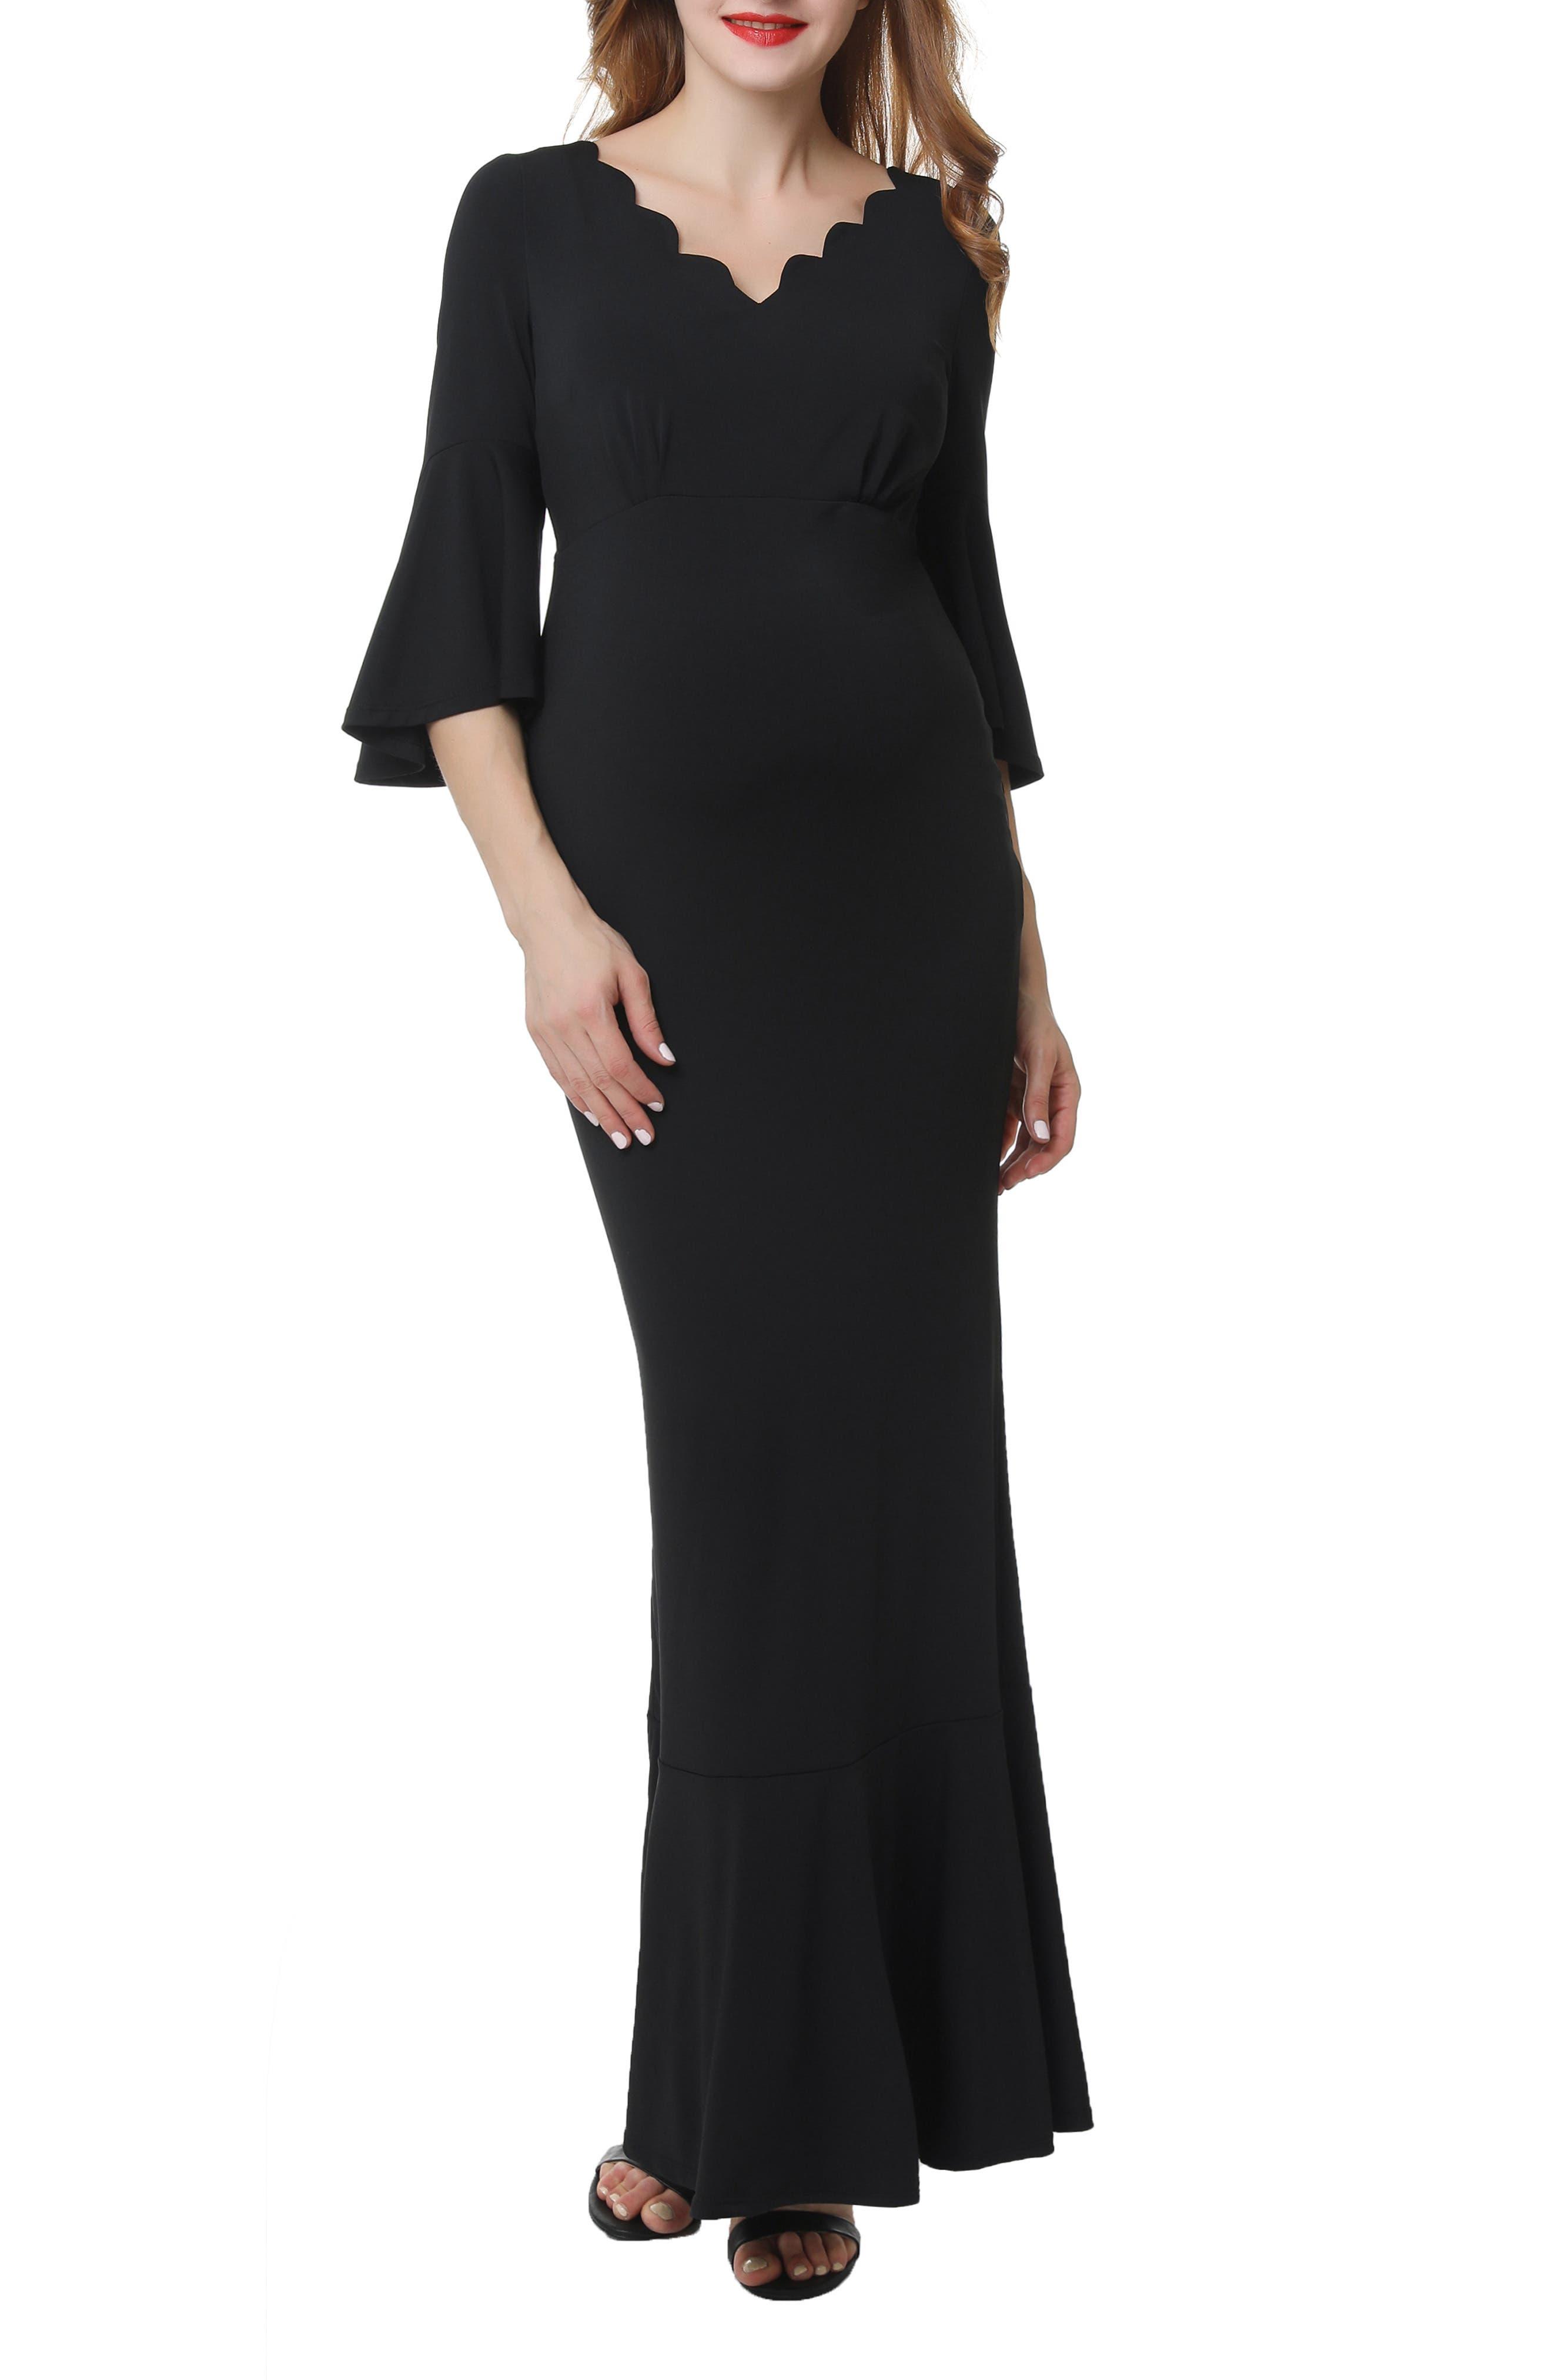 Kimi And Kai Maisie Scalloped Maternity Mermaid Dress, Black